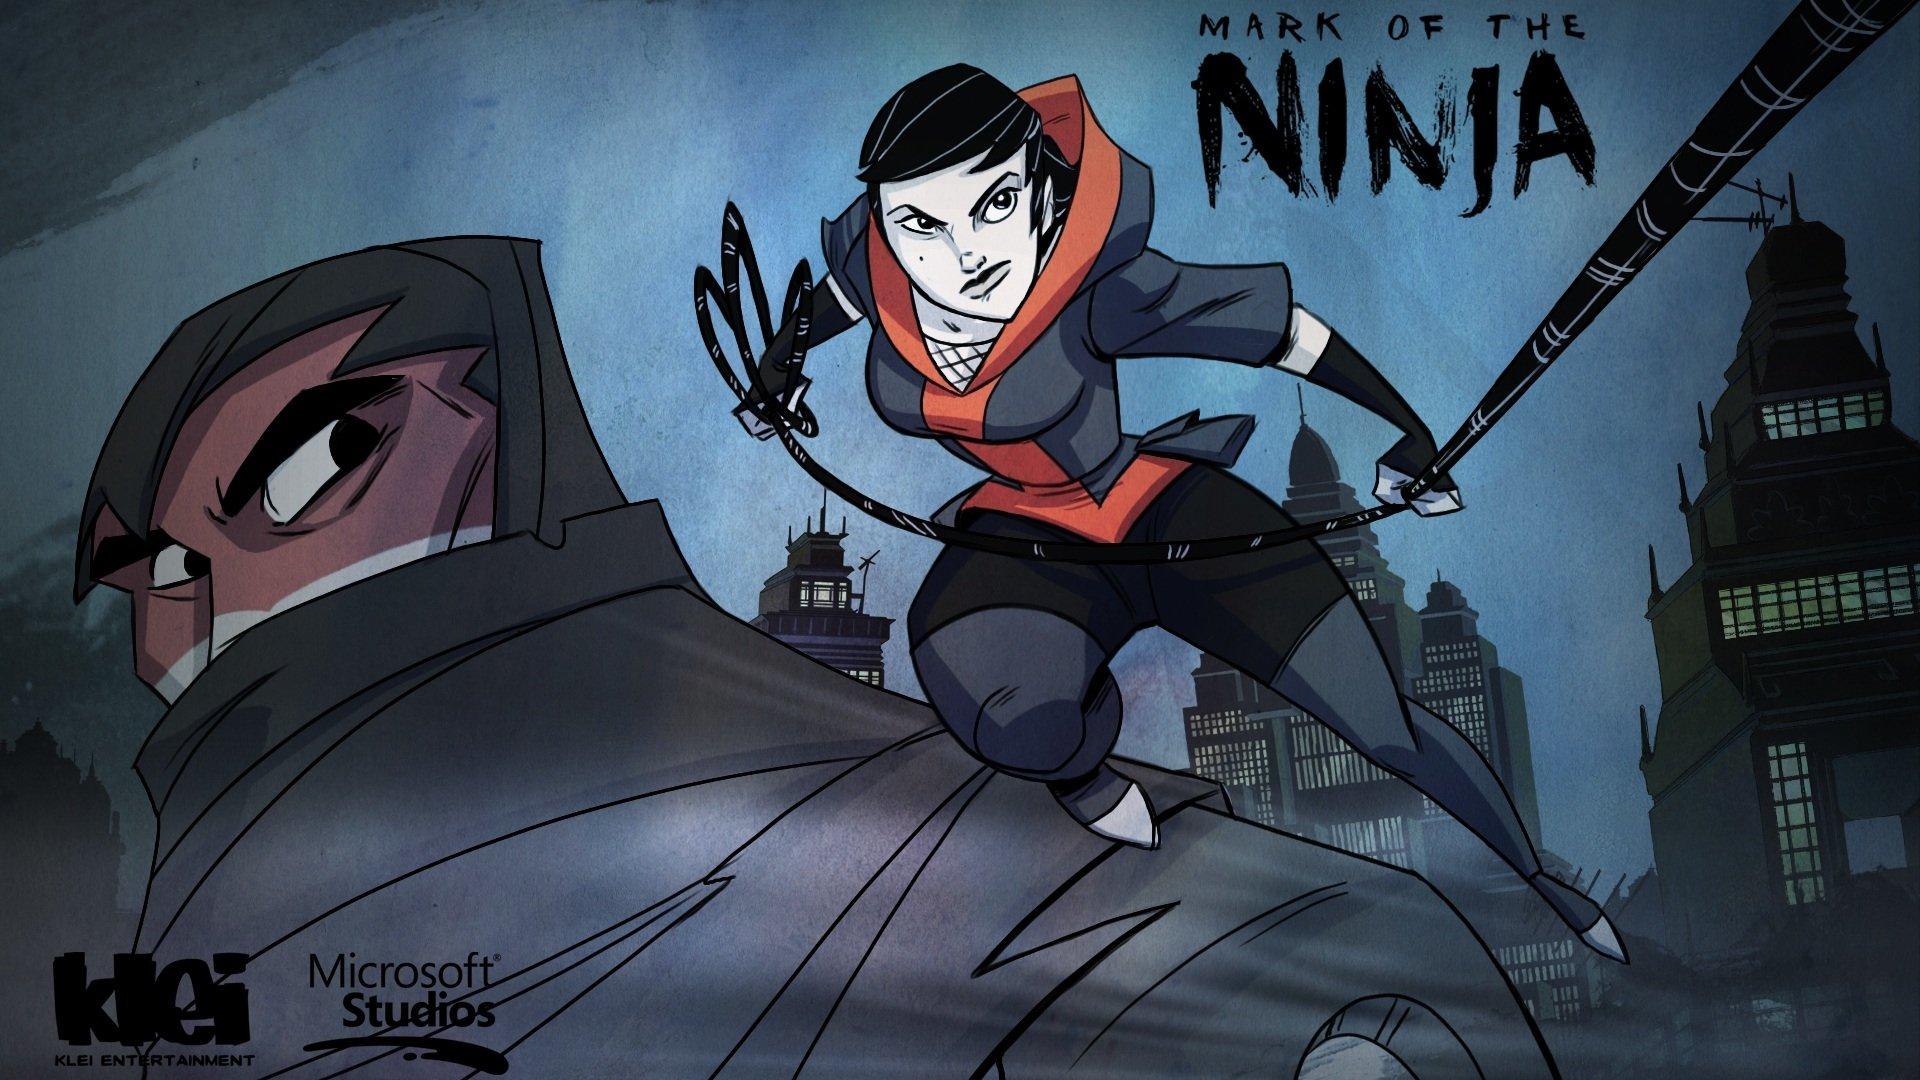 Mark Of The Ninja Hd Wallpaper Background Image 1920x1080 Id